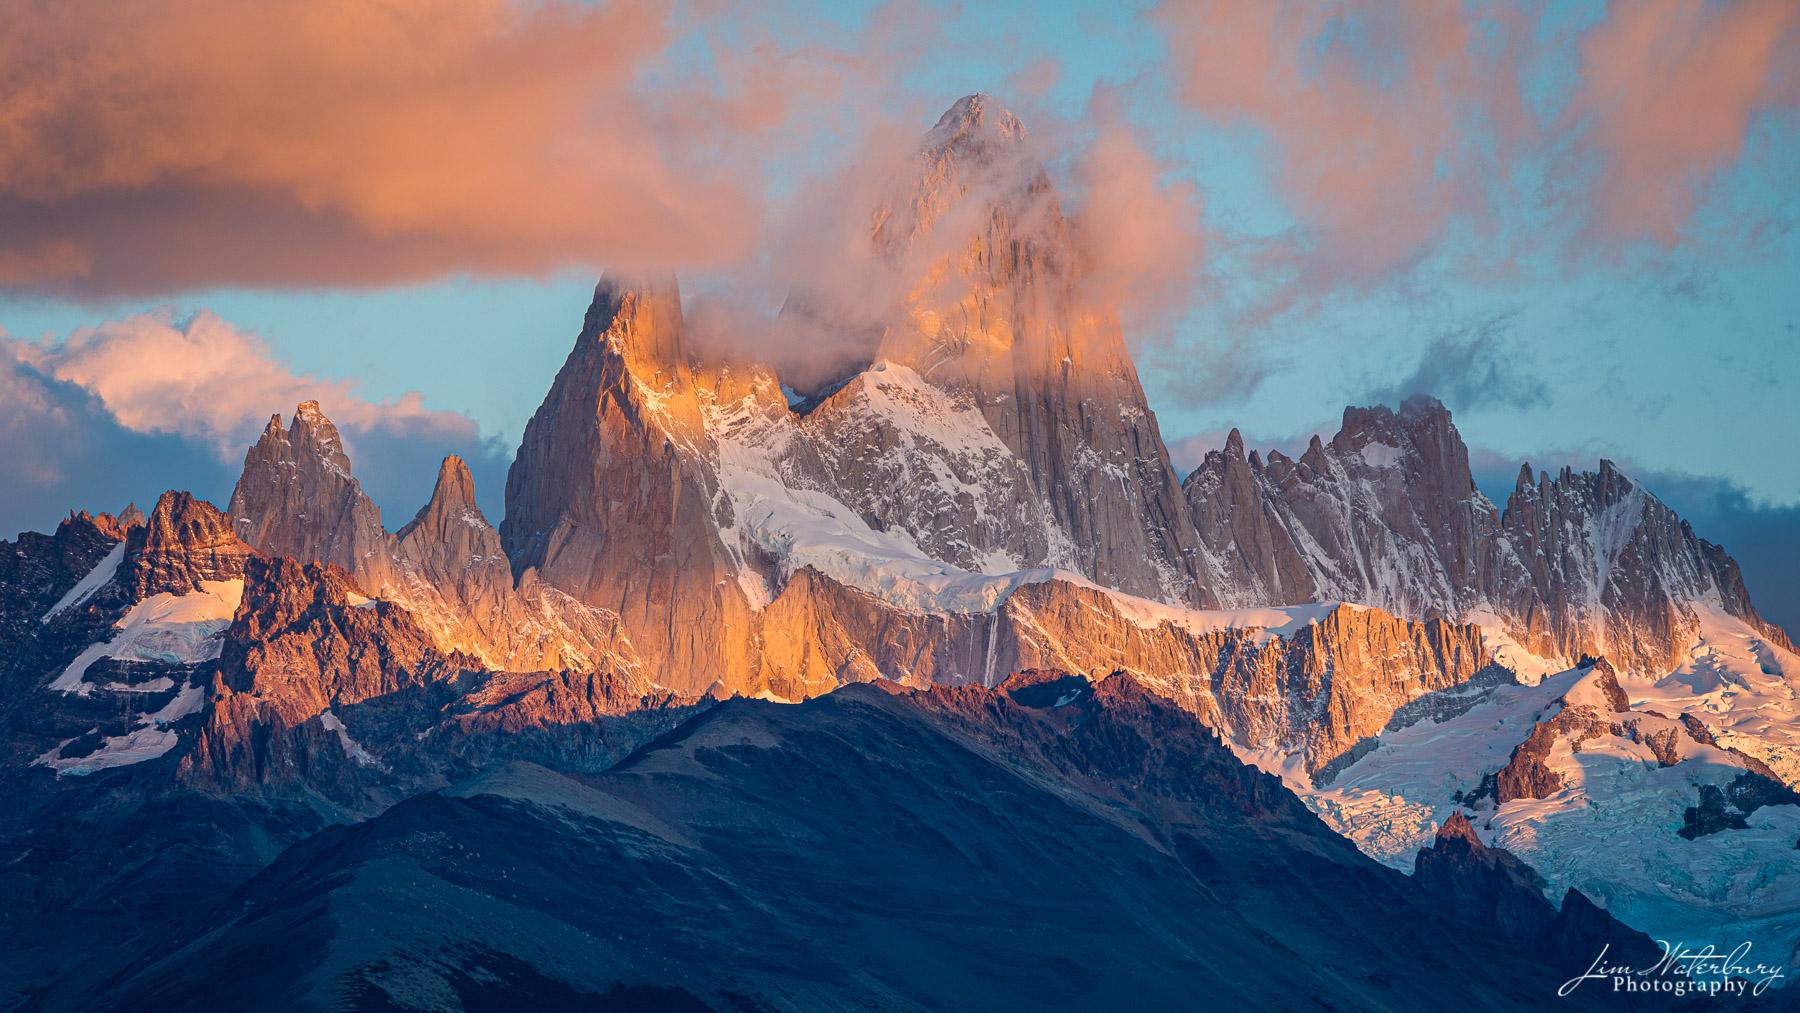 Mt Fitz Roy, at sunrise, in Los Glaciares National Park, Argentina (Patagonia)